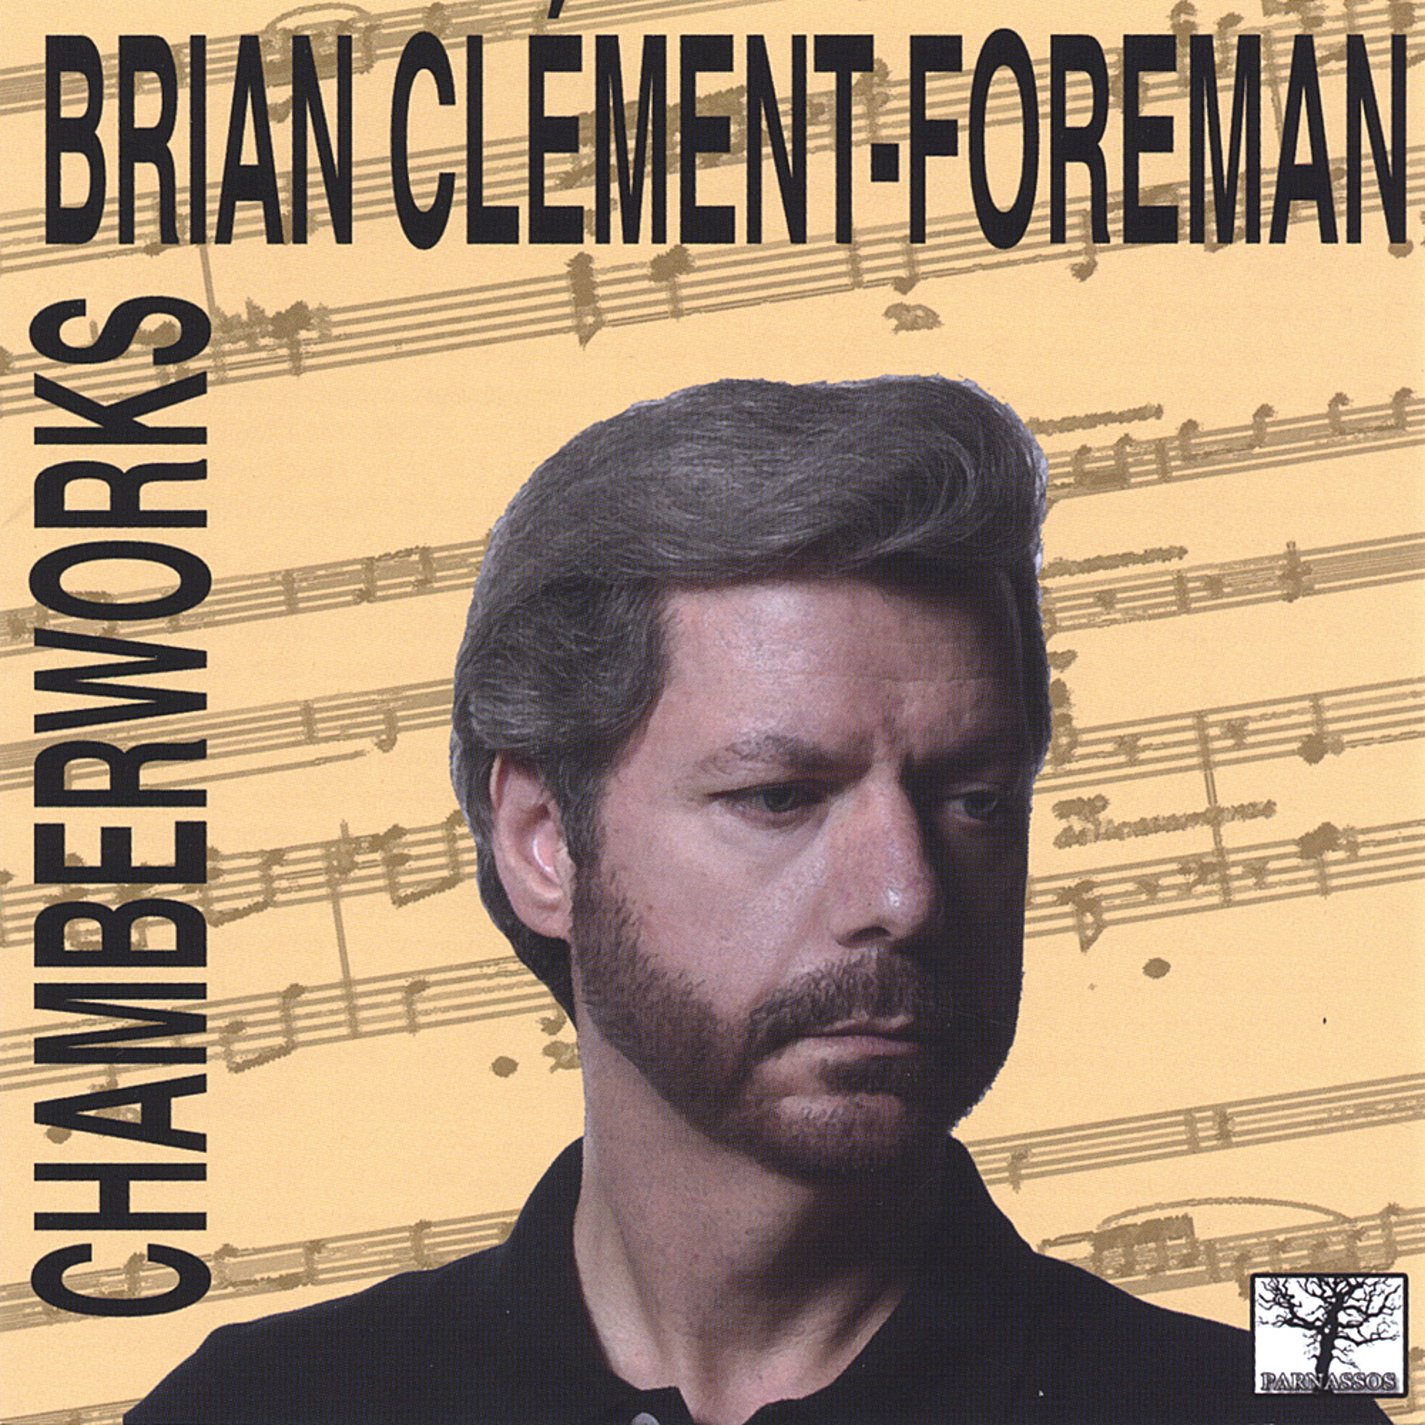 Chamberworks by CD Baby